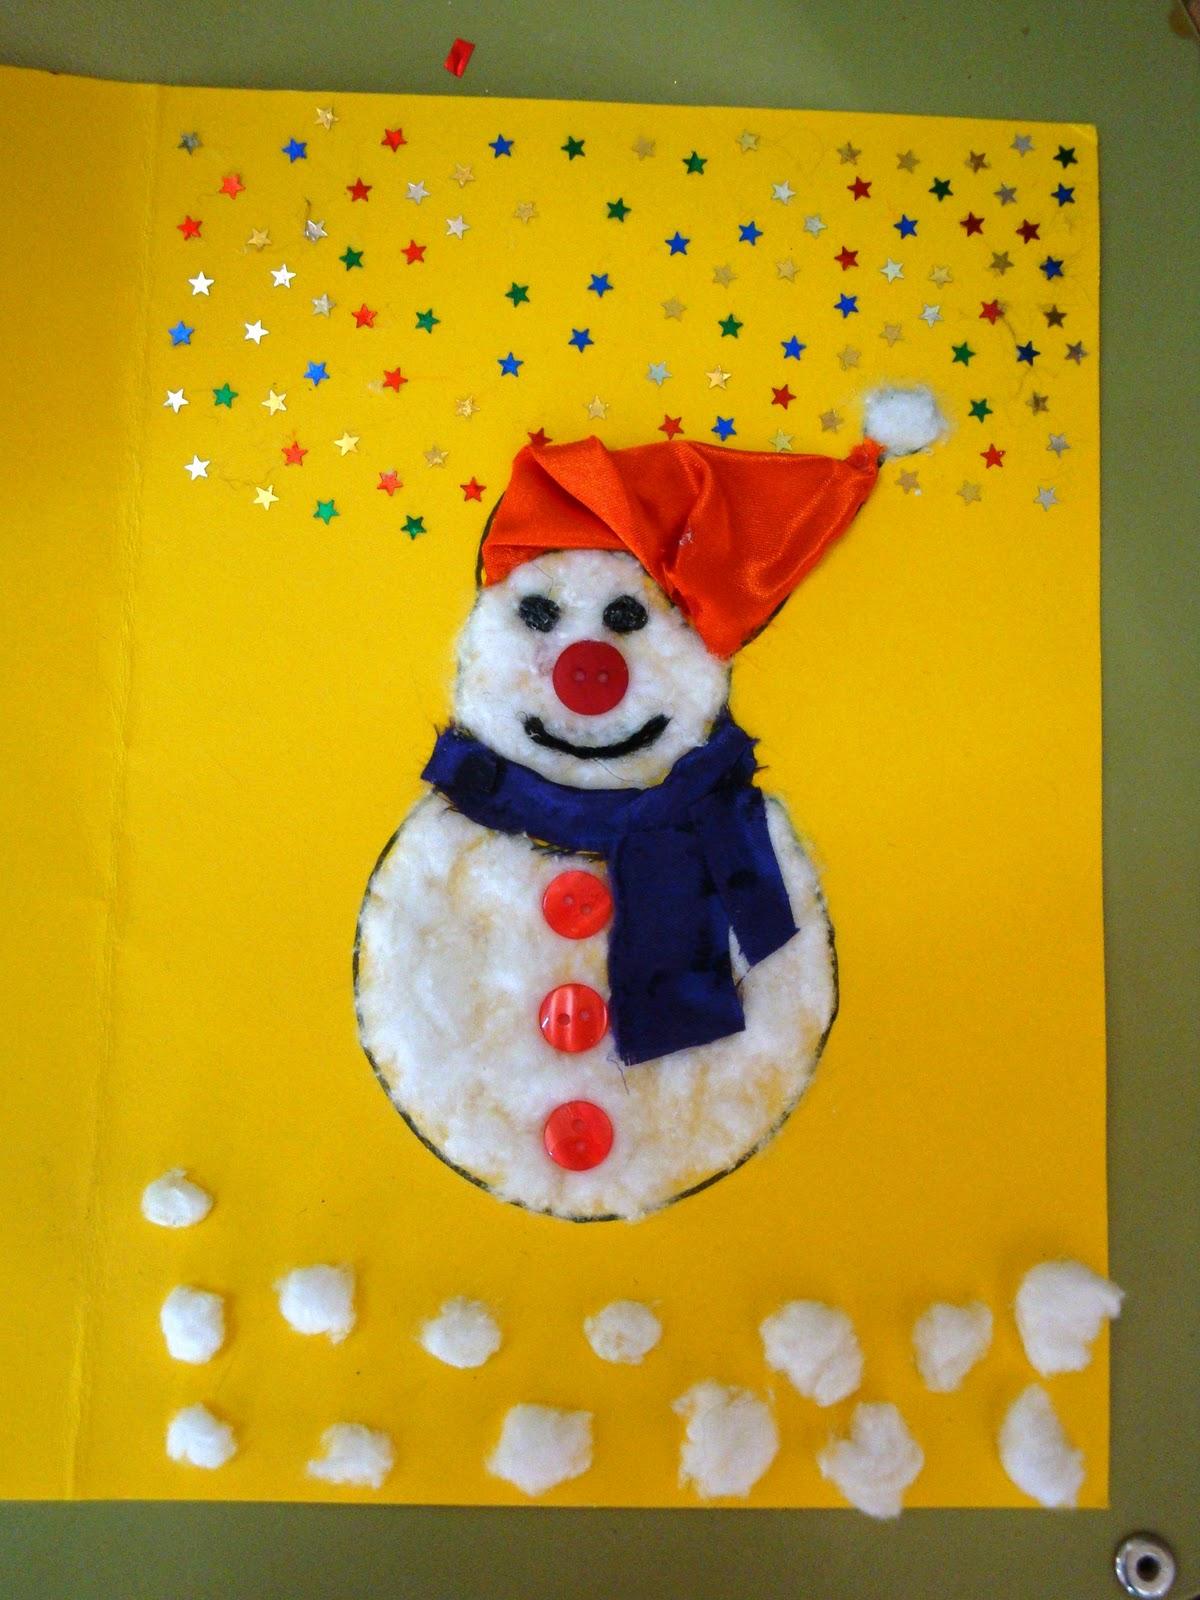 Maestra de infantil tarjetas de navidad hechas por ni os - Postales navidad hechas por ninos ...